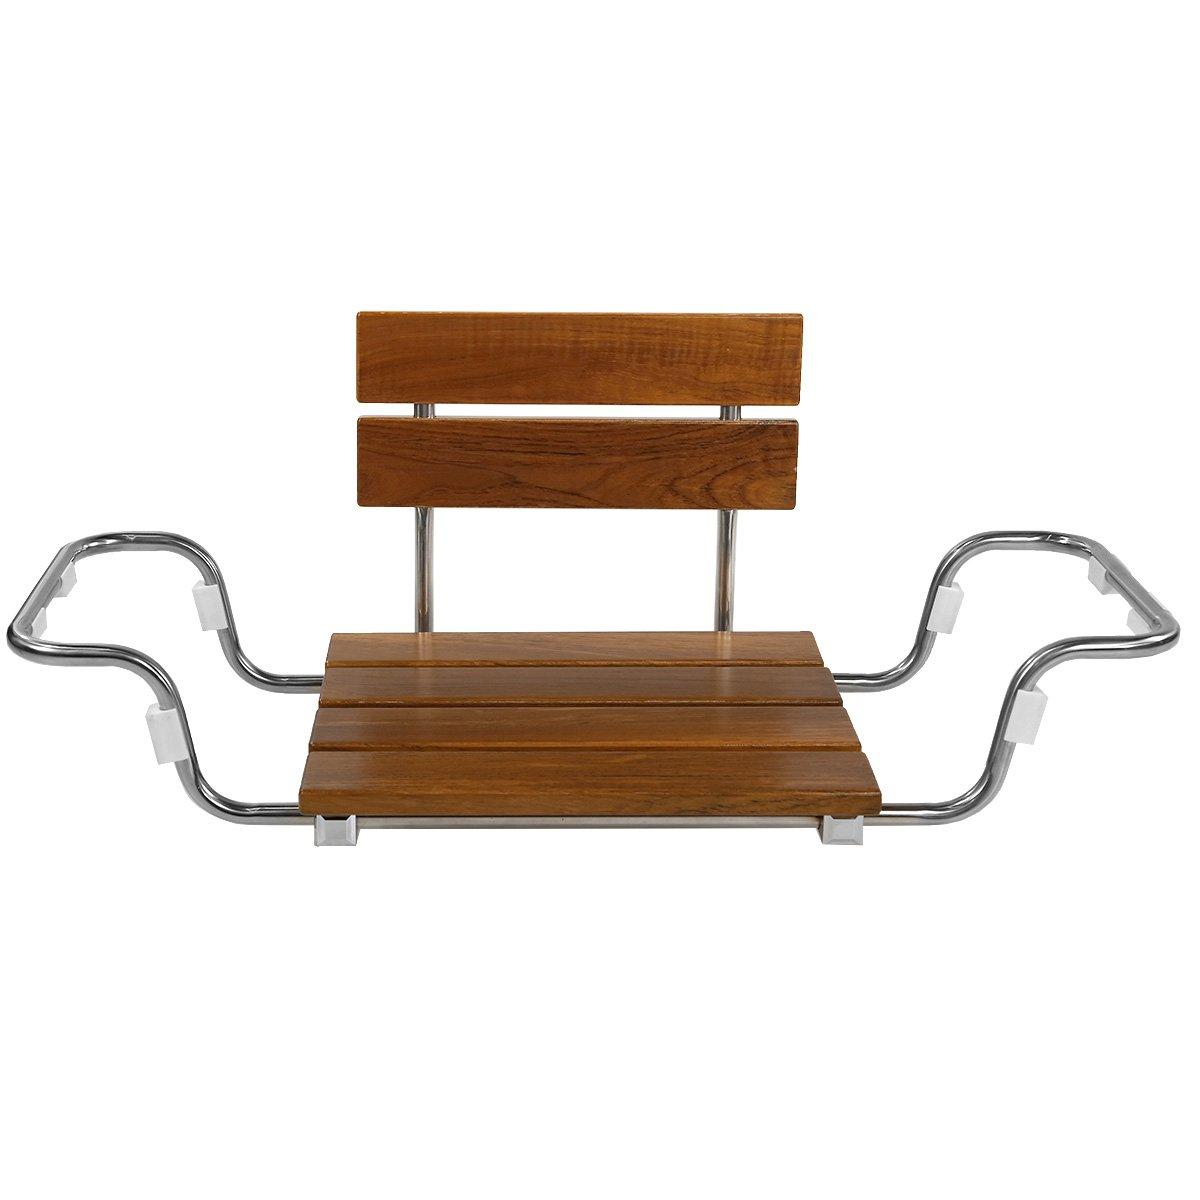 Clevr Adjustable Foldable Teak Wood Bathtub Seat Shower Bench, Waterproof Solid Teak Wood Modern Chrome, Width Adjustable to Fit Most Bathtub, Foldable Removable for Easy Storage